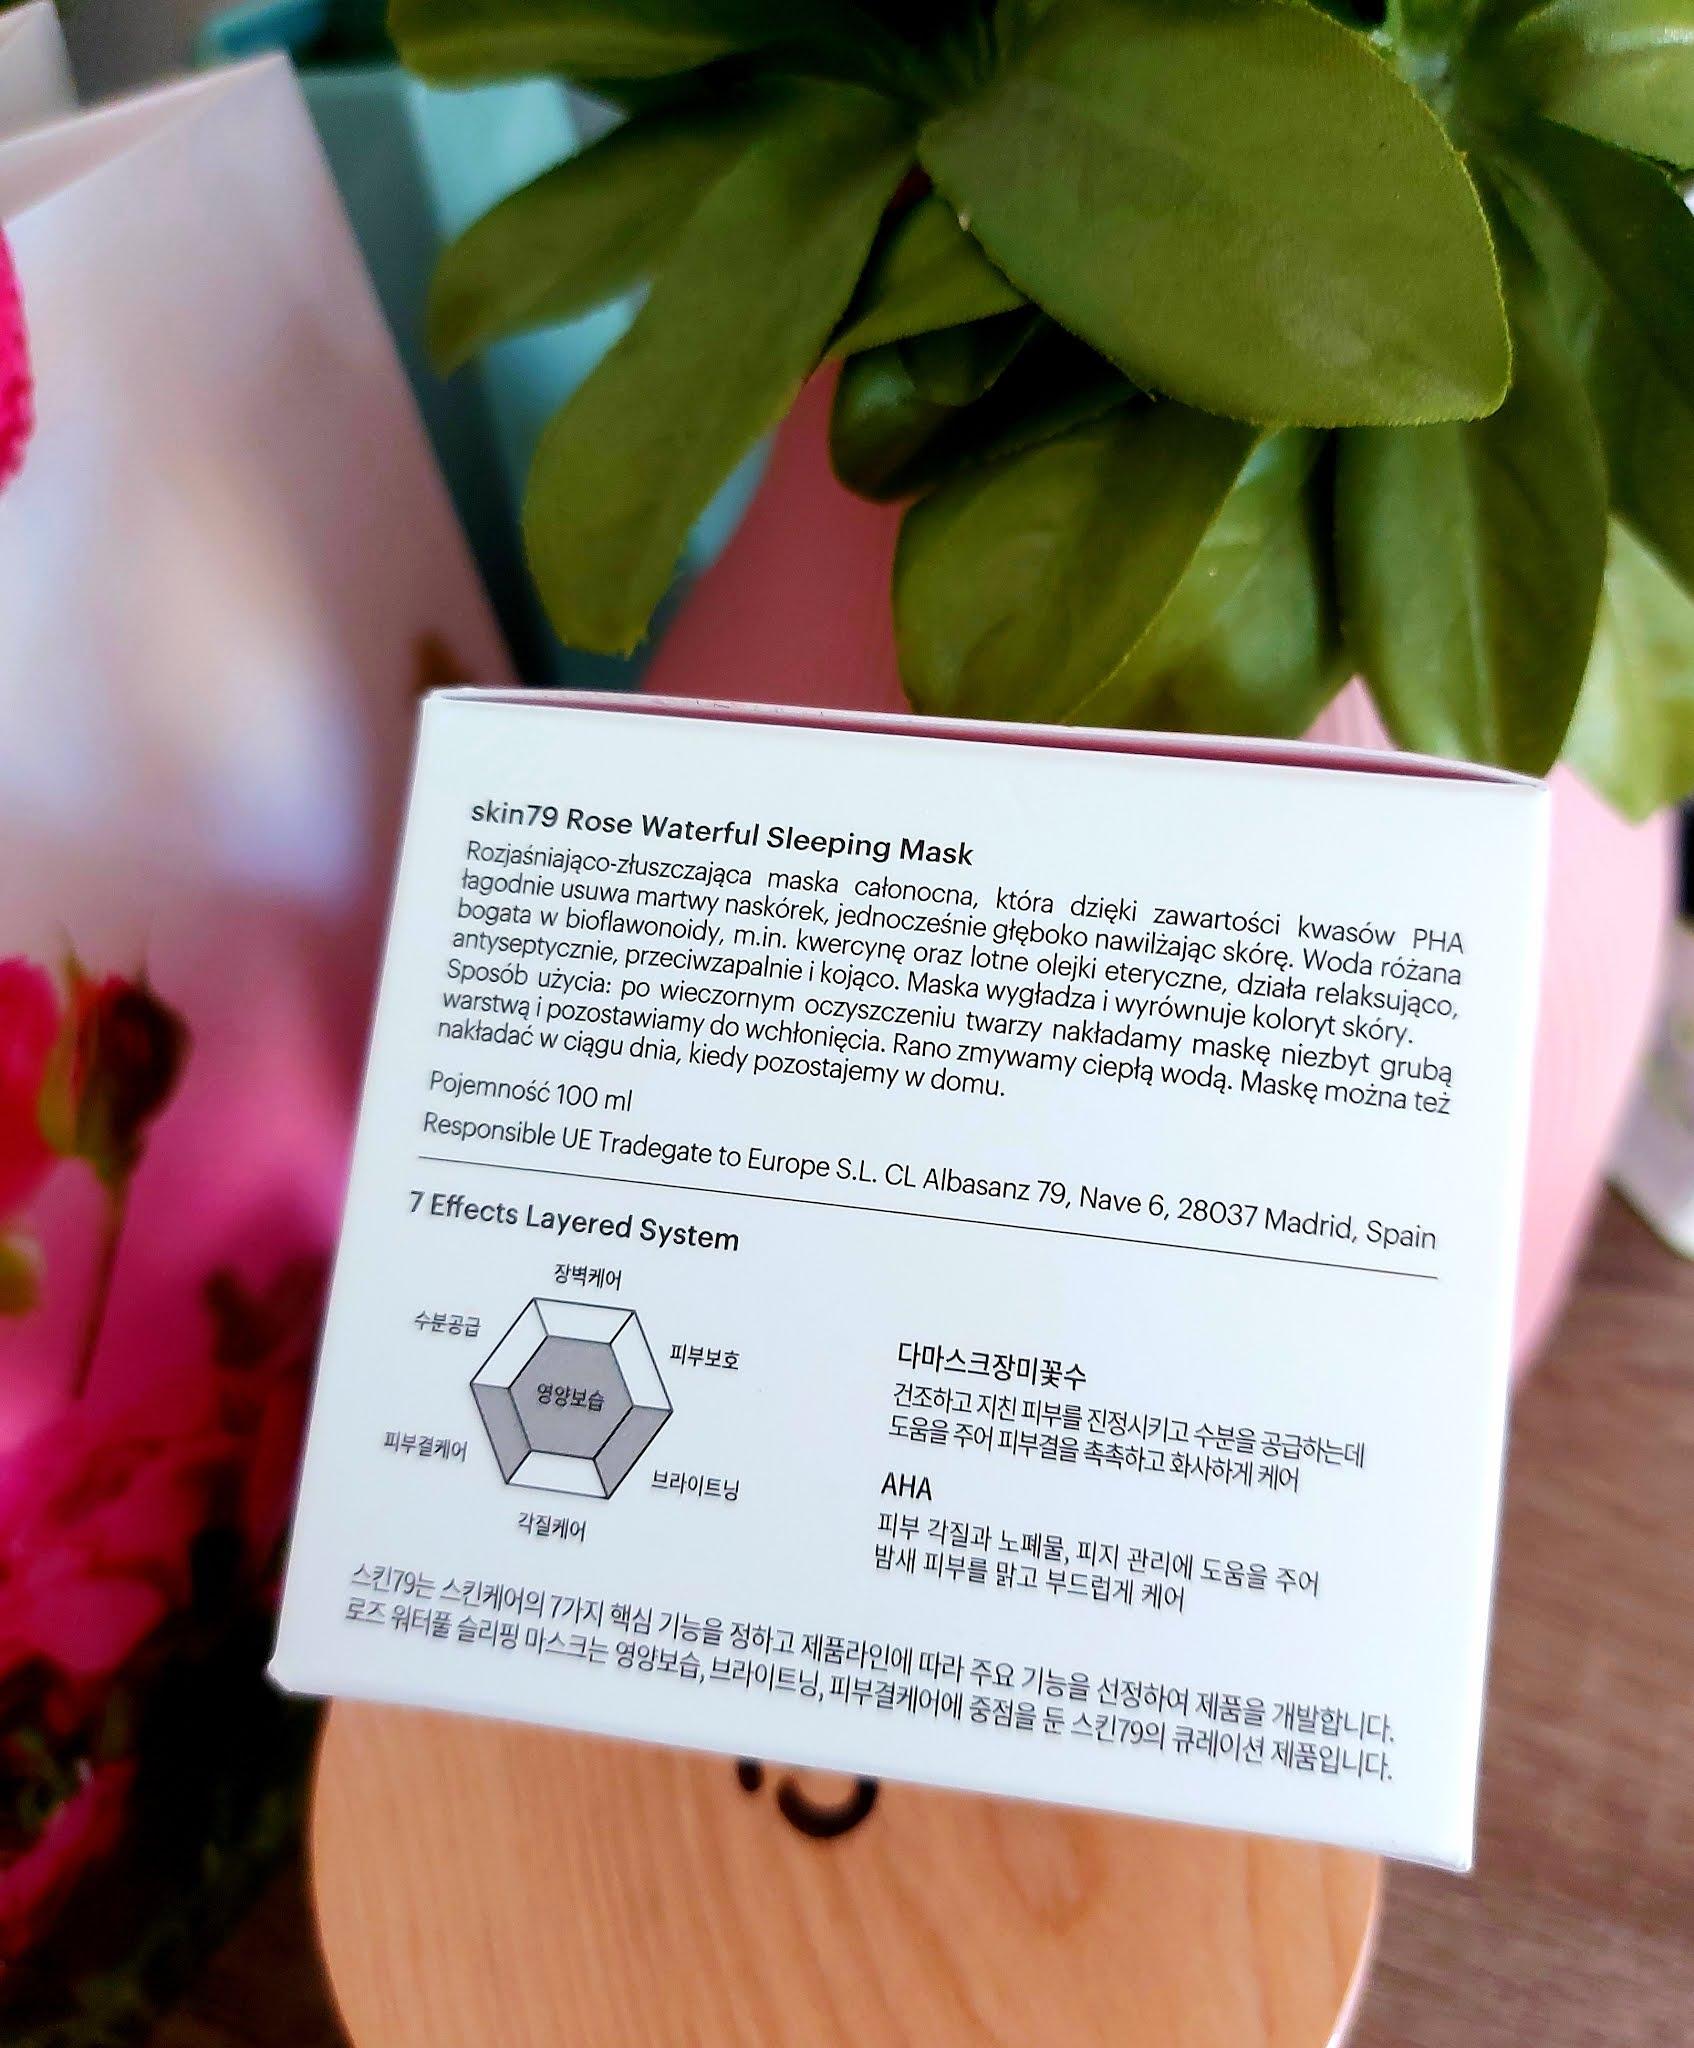 ROSE WATERFUL SLEEPING MASK - koreanska maska nawilzajaca o zapachu róży od Skin 79 Aneta Lason Beauty Talks